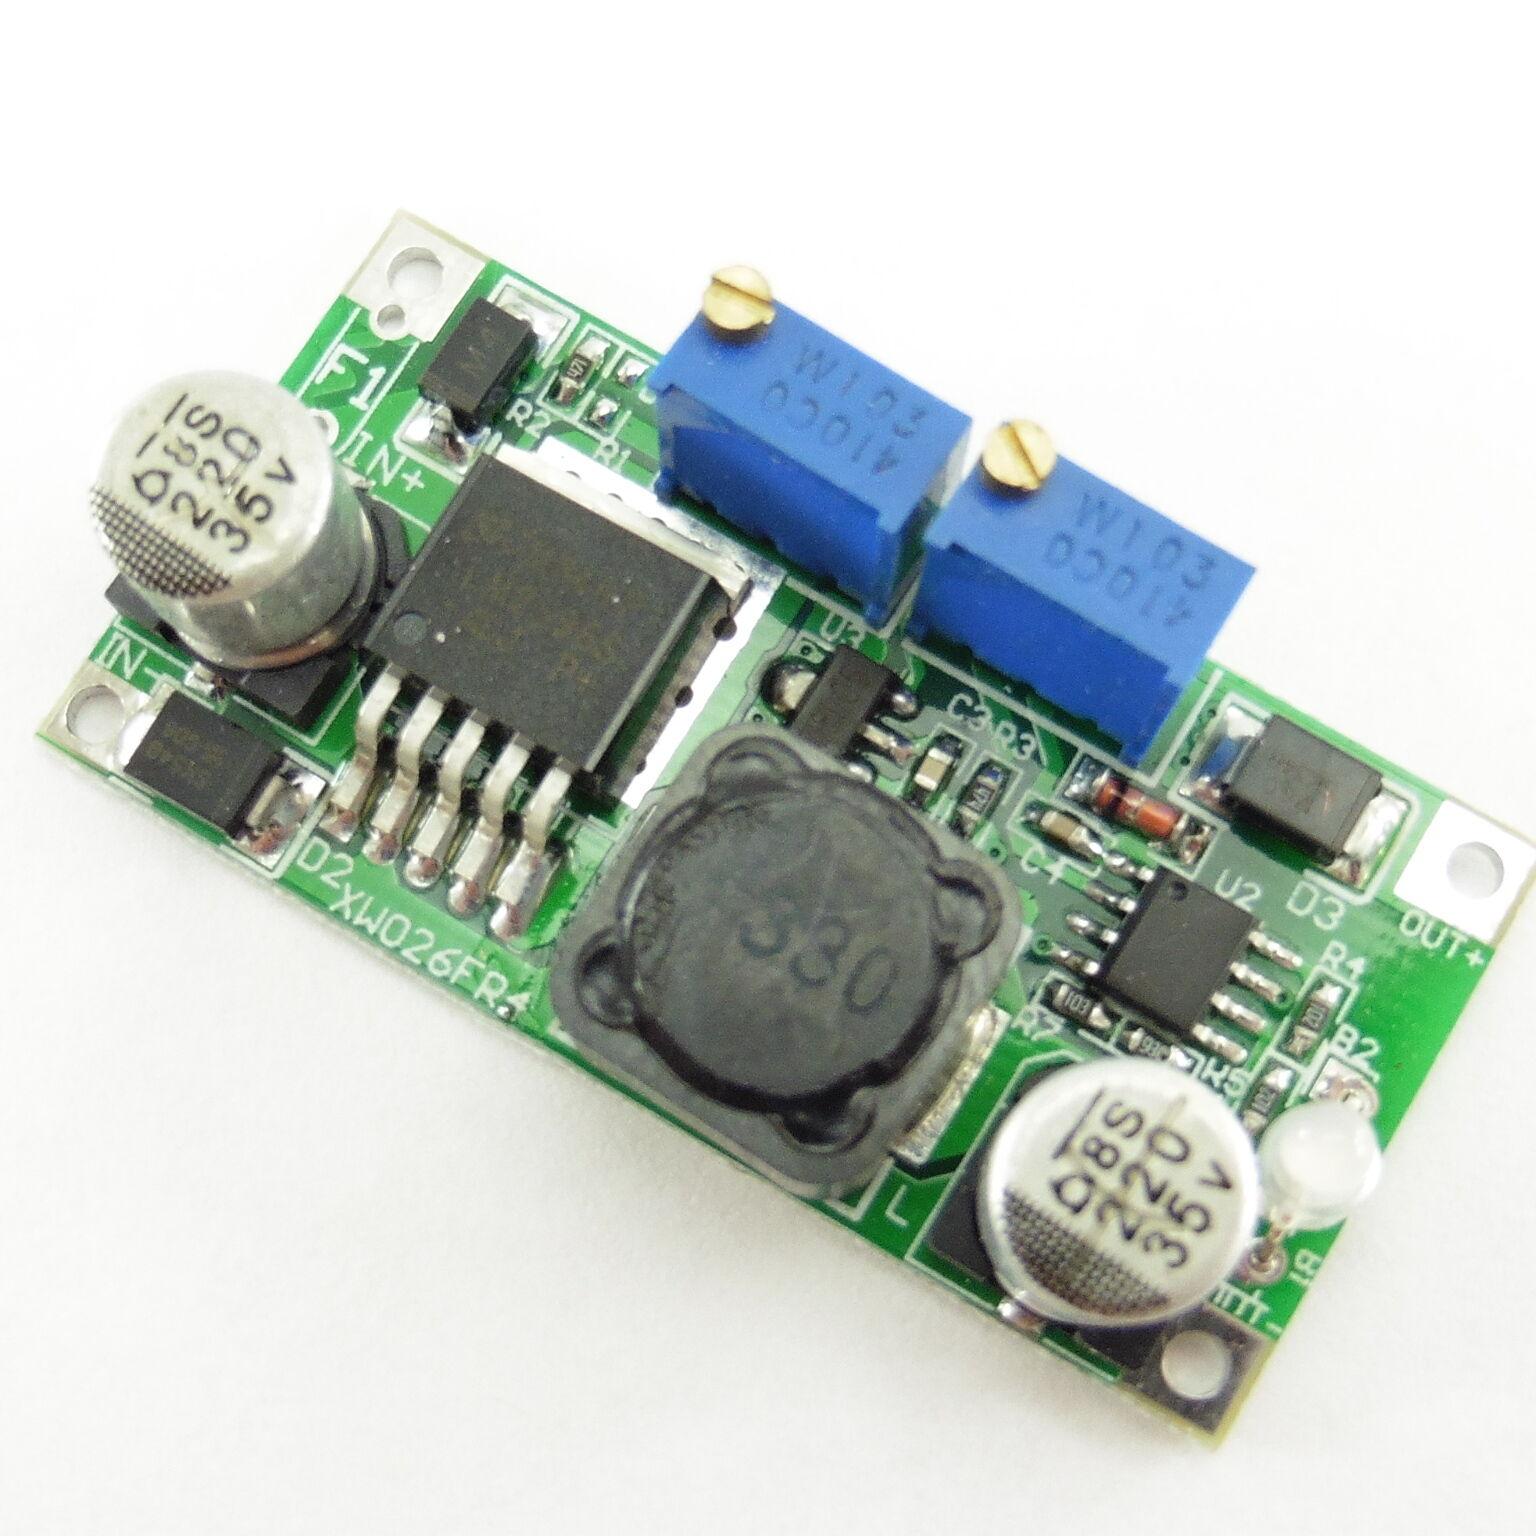 DC DC CV CC 2A LED Driver Power Supply Module LM2596 Step-Down Constant Current